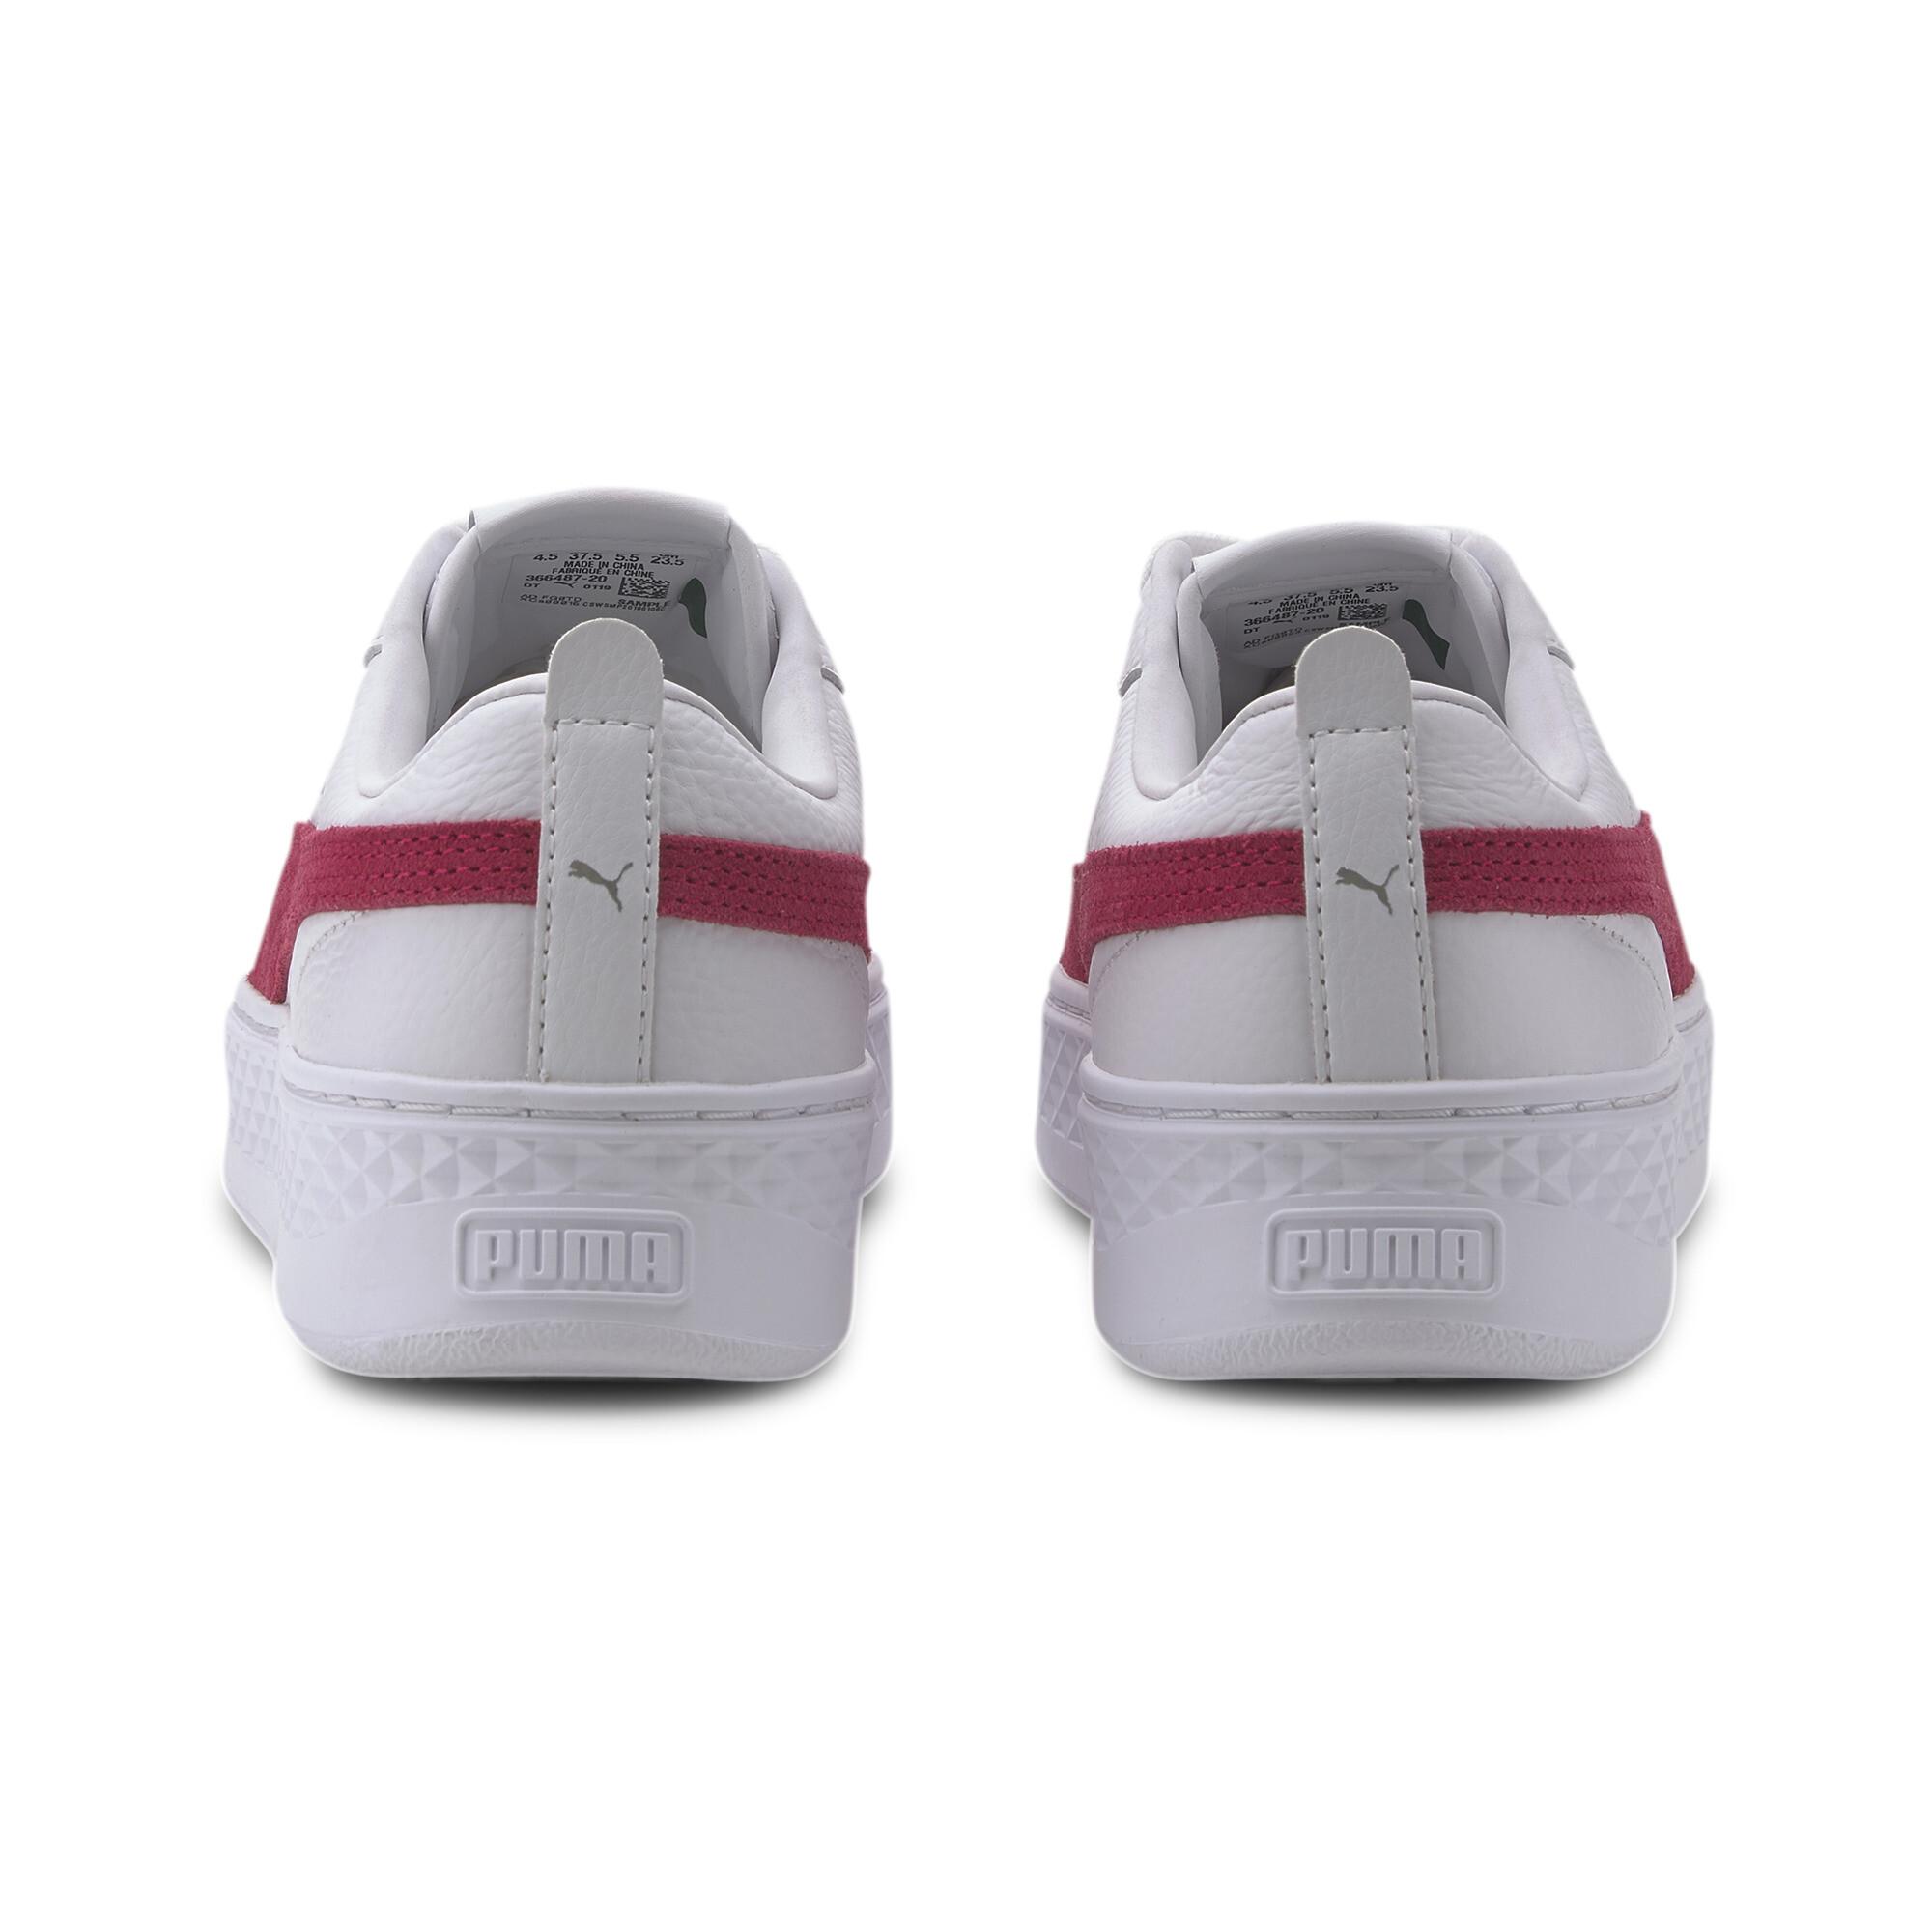 PUMA-Smash-Platform-Leather-Women-039-s-Sneakers-Women-Shoe-Basics thumbnail 8